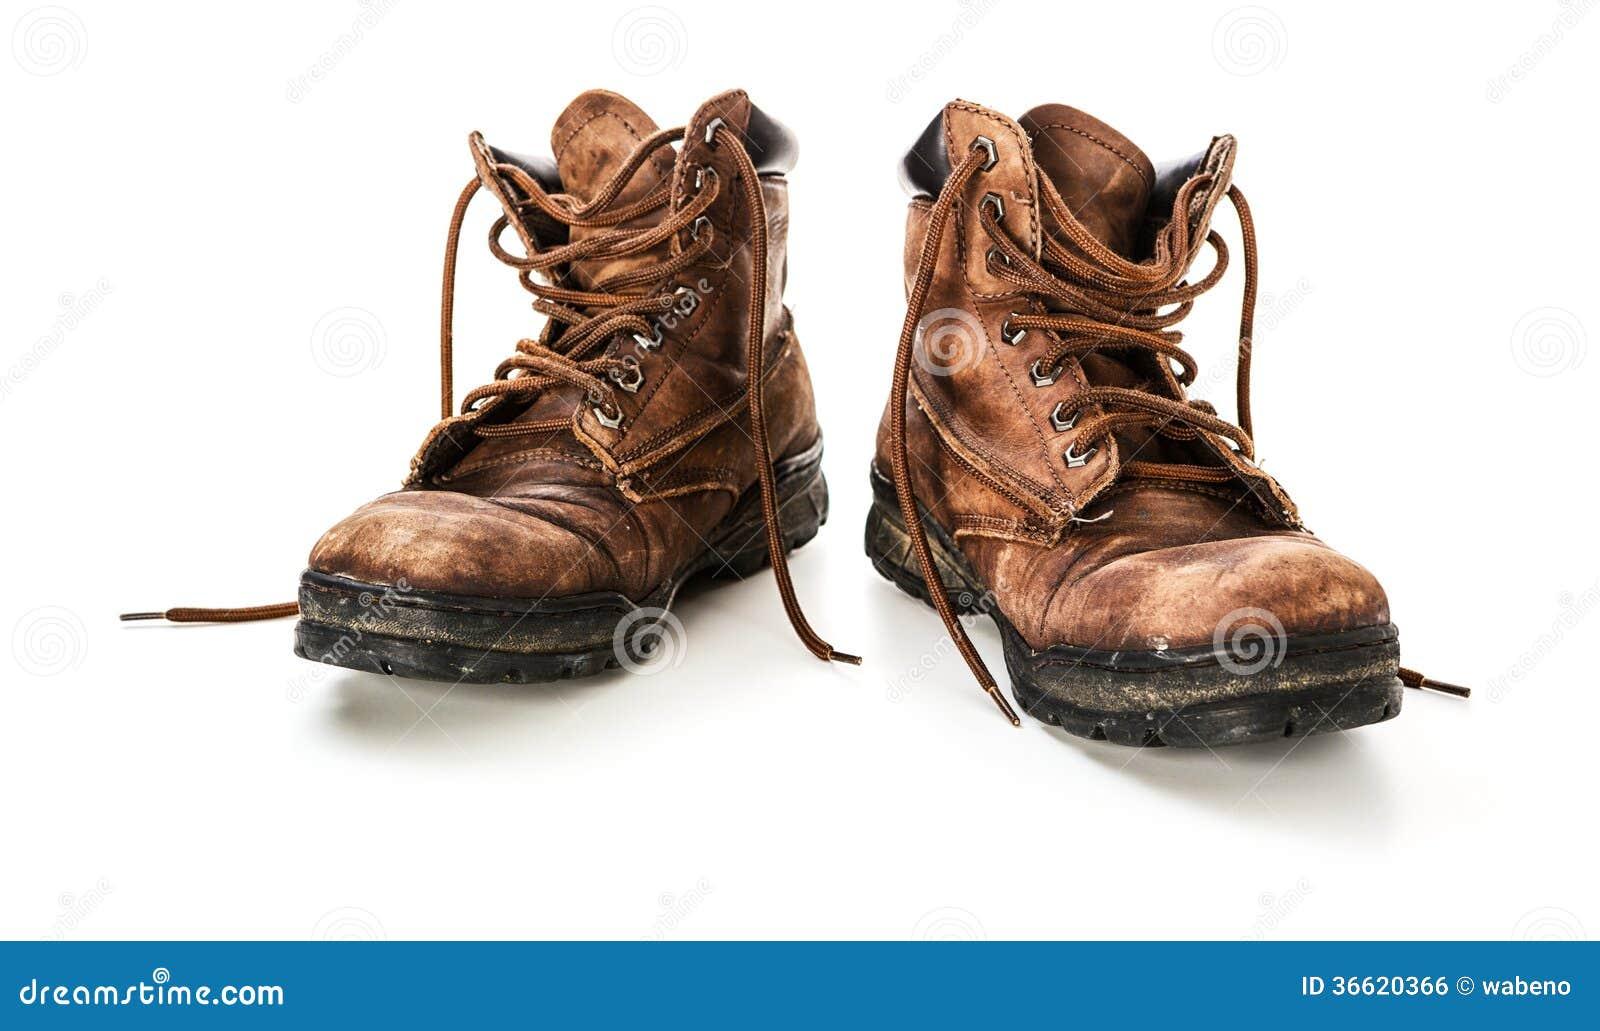 Walking Shoes Background